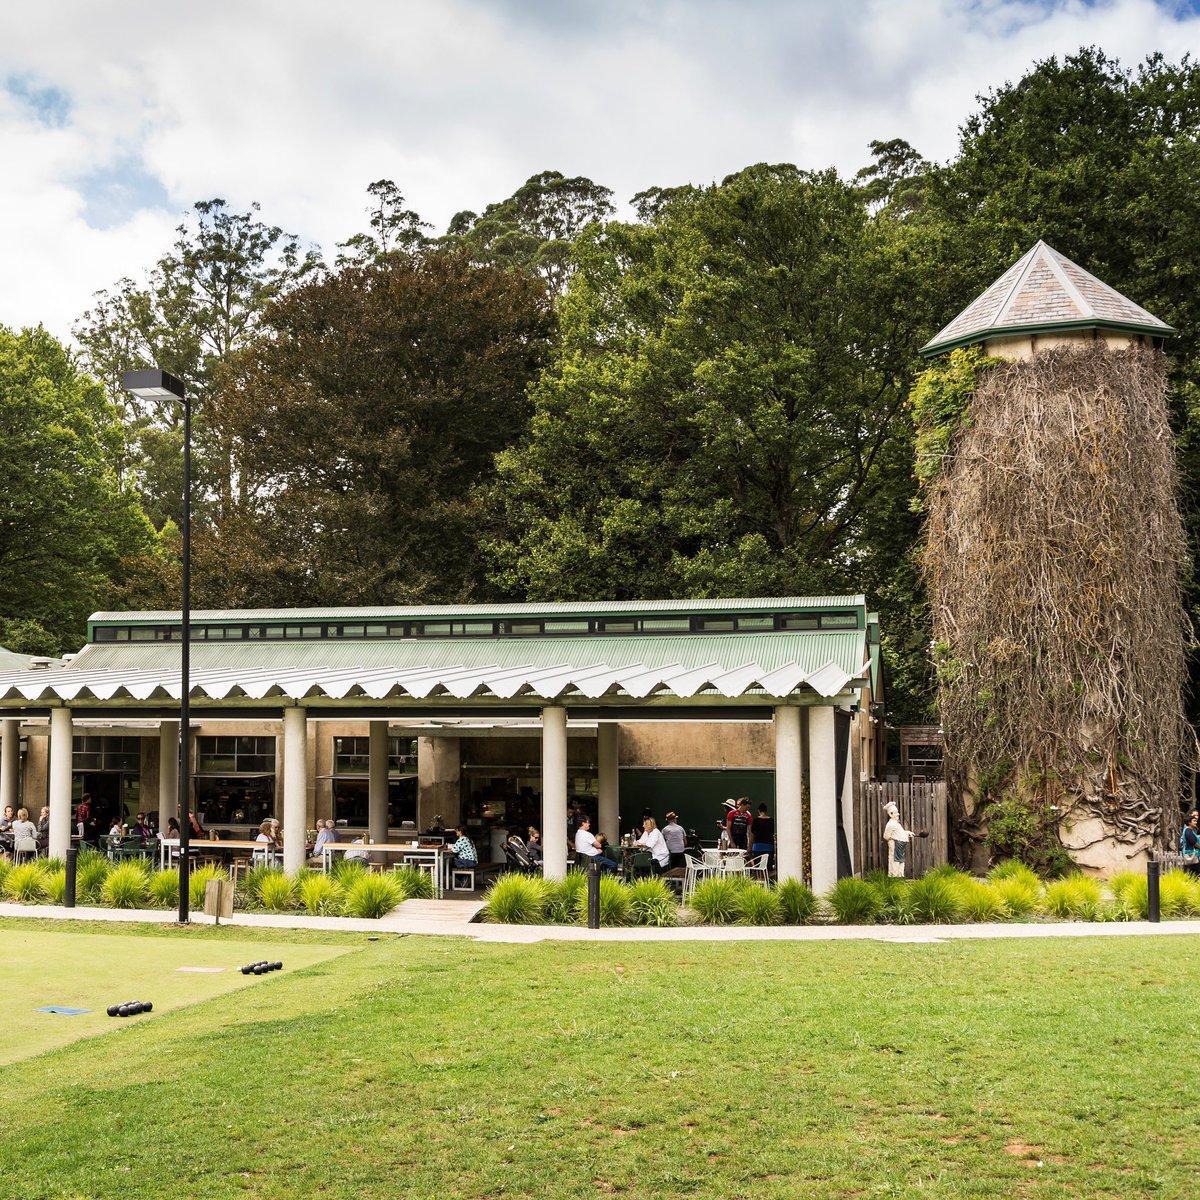 test Twitter Media - ❤️ The Piggery Cafe at Burnham Beeches, Dandenong Ranges ❤️ The Provenance Hotel, Beechworth https://t.co/7nVOOgwKPO